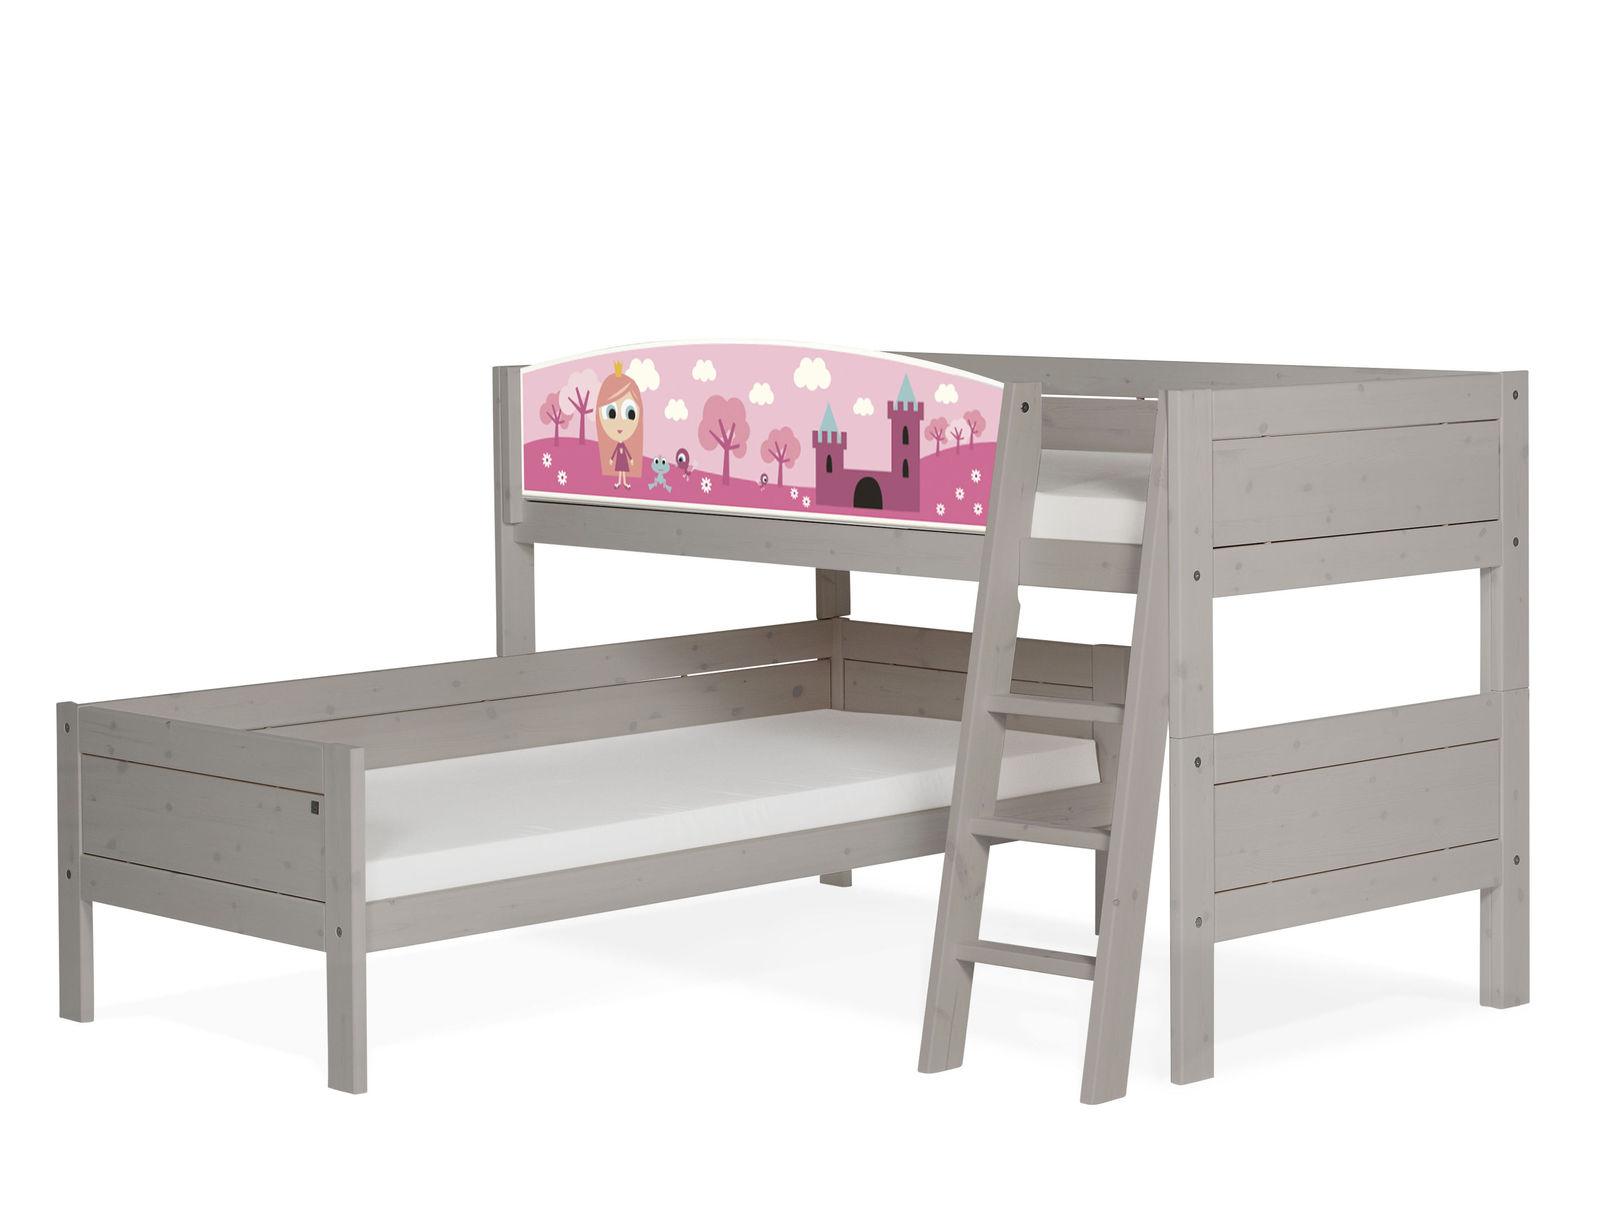 lifetime doppelstockbett ber eck f r m dchen prinzessin. Black Bedroom Furniture Sets. Home Design Ideas